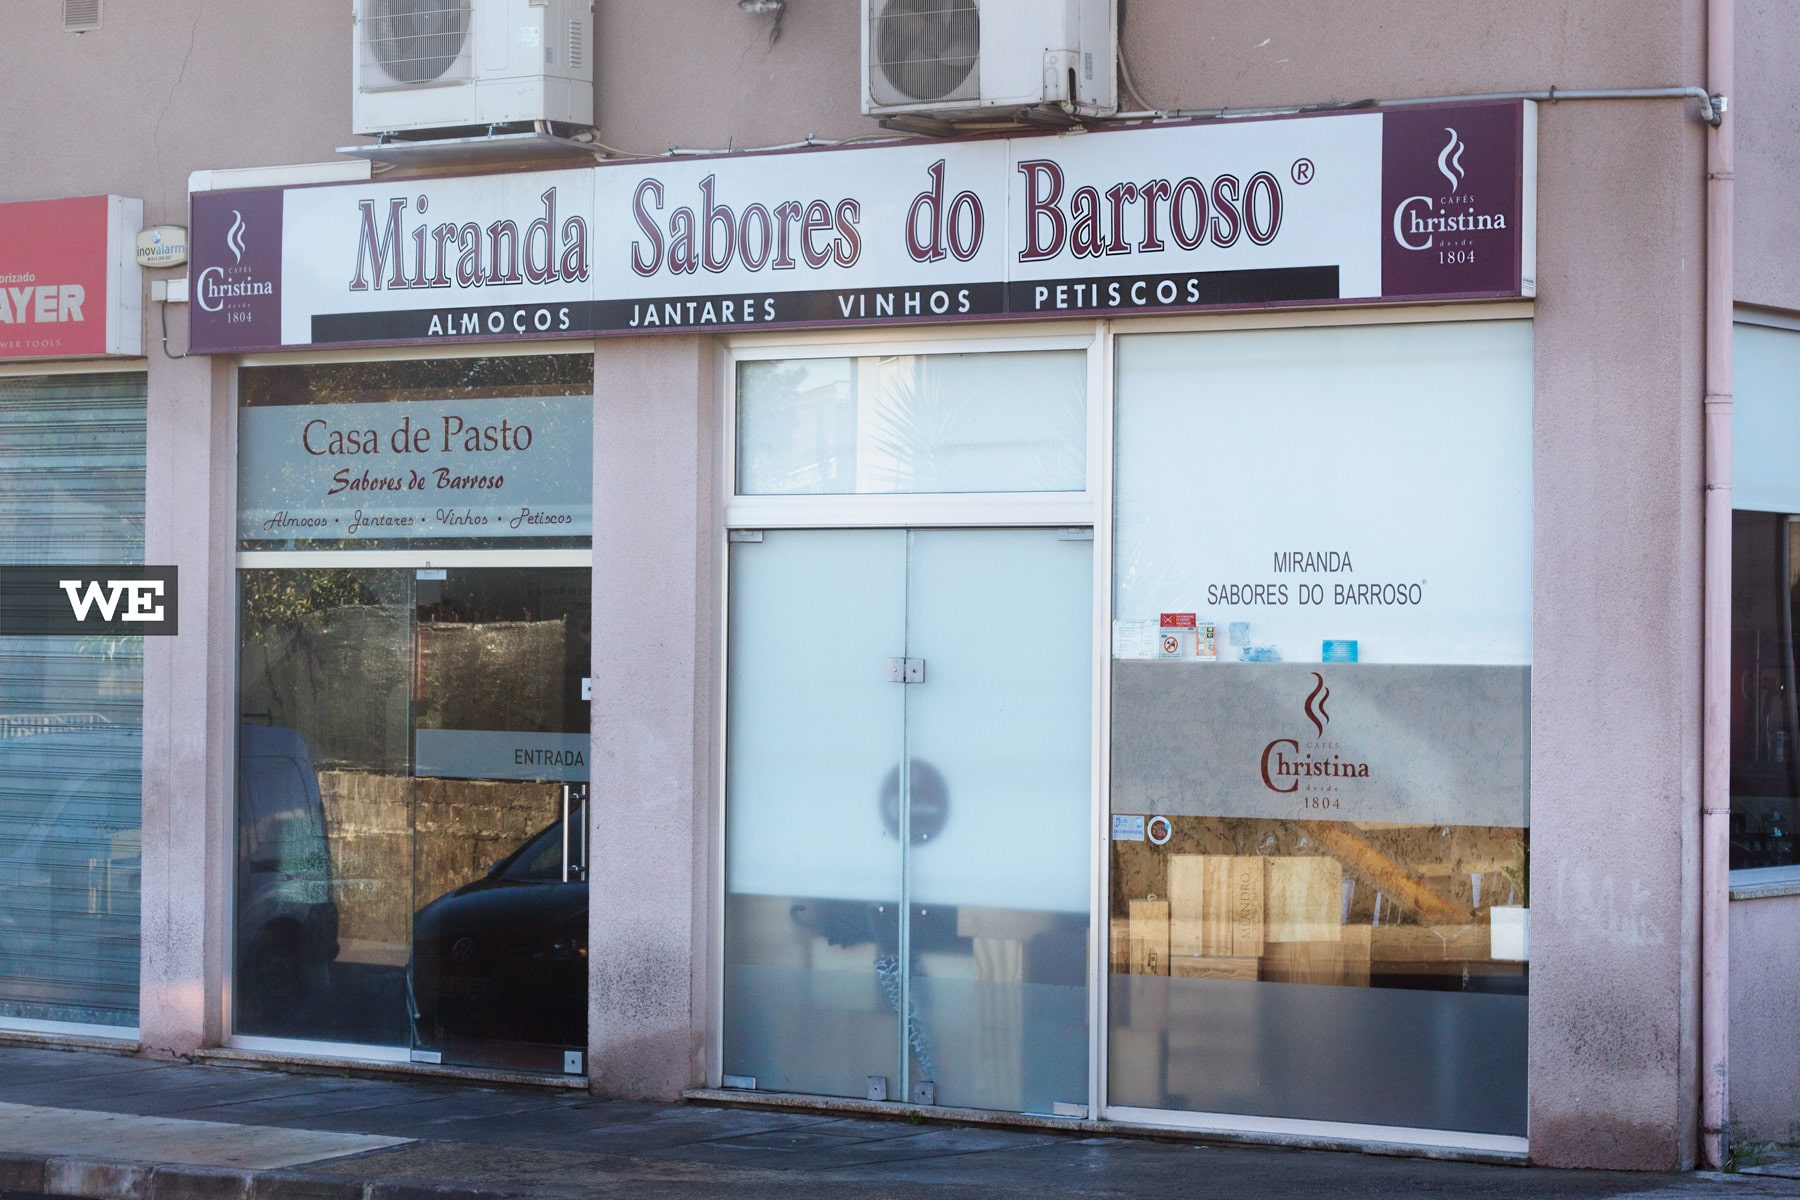 Miranda Sabores do Barroso Tascos em Braga